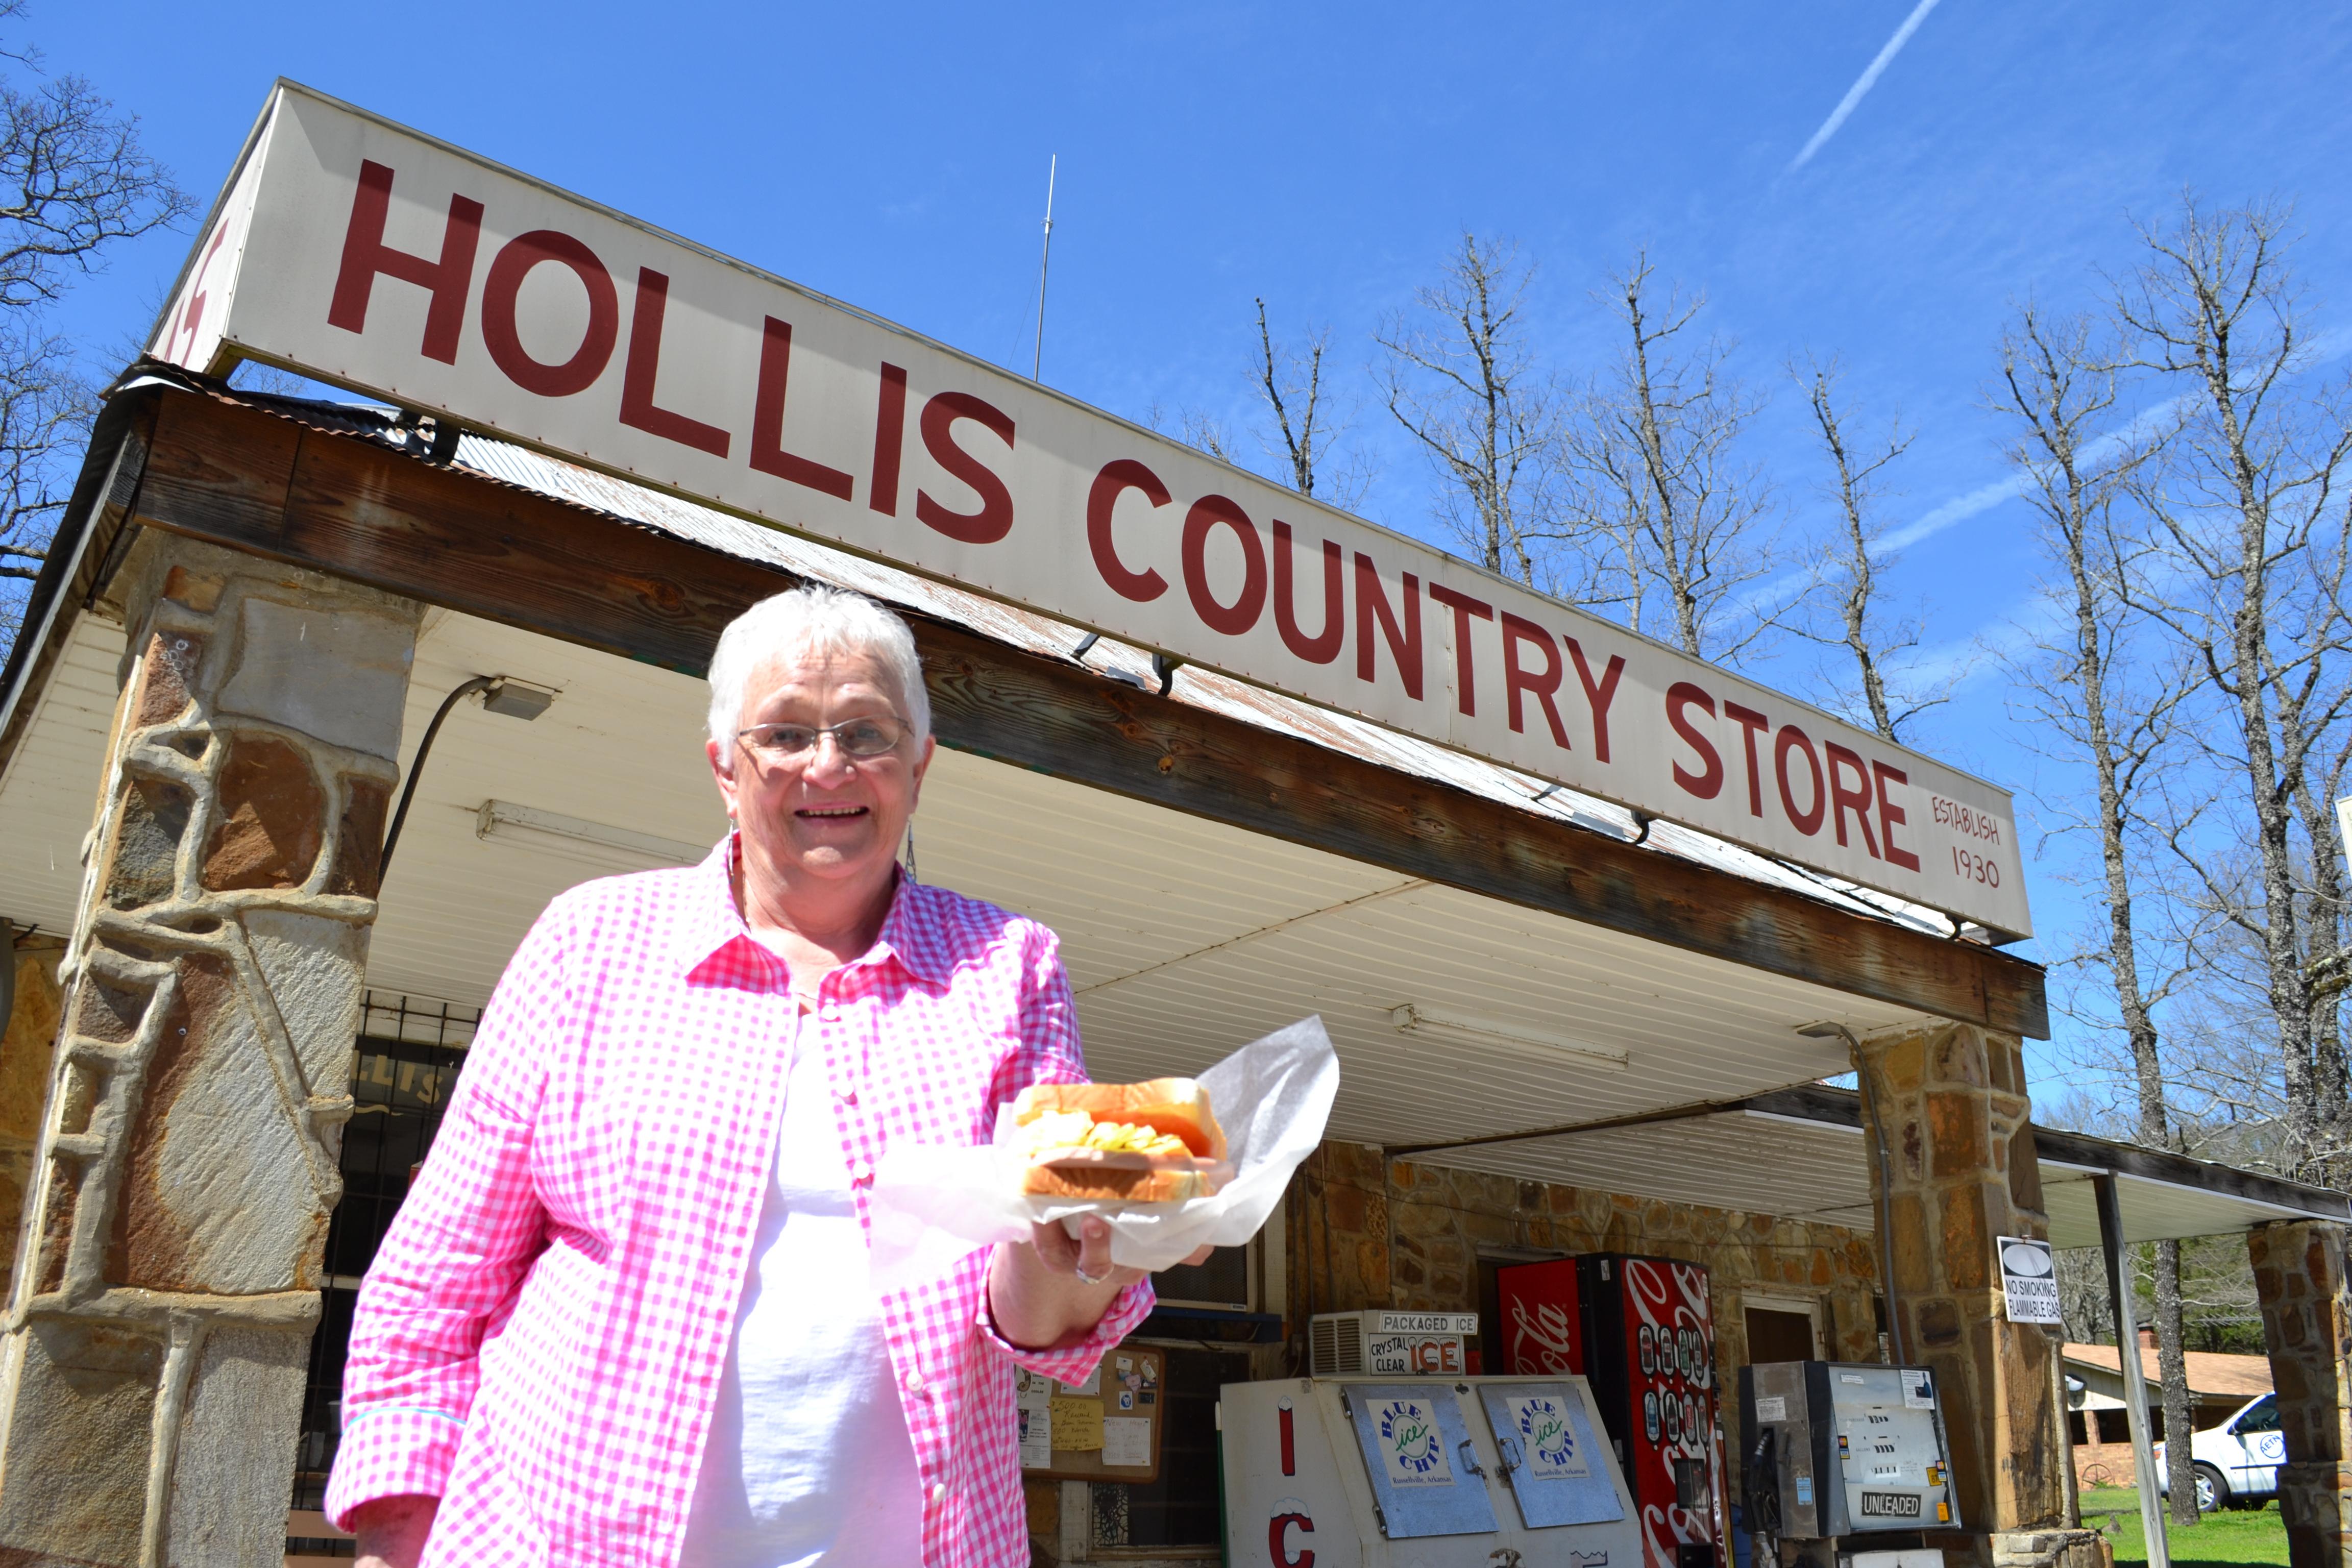 Exploring Arkansas June 2016 Hollis Country Store Connie Hawks